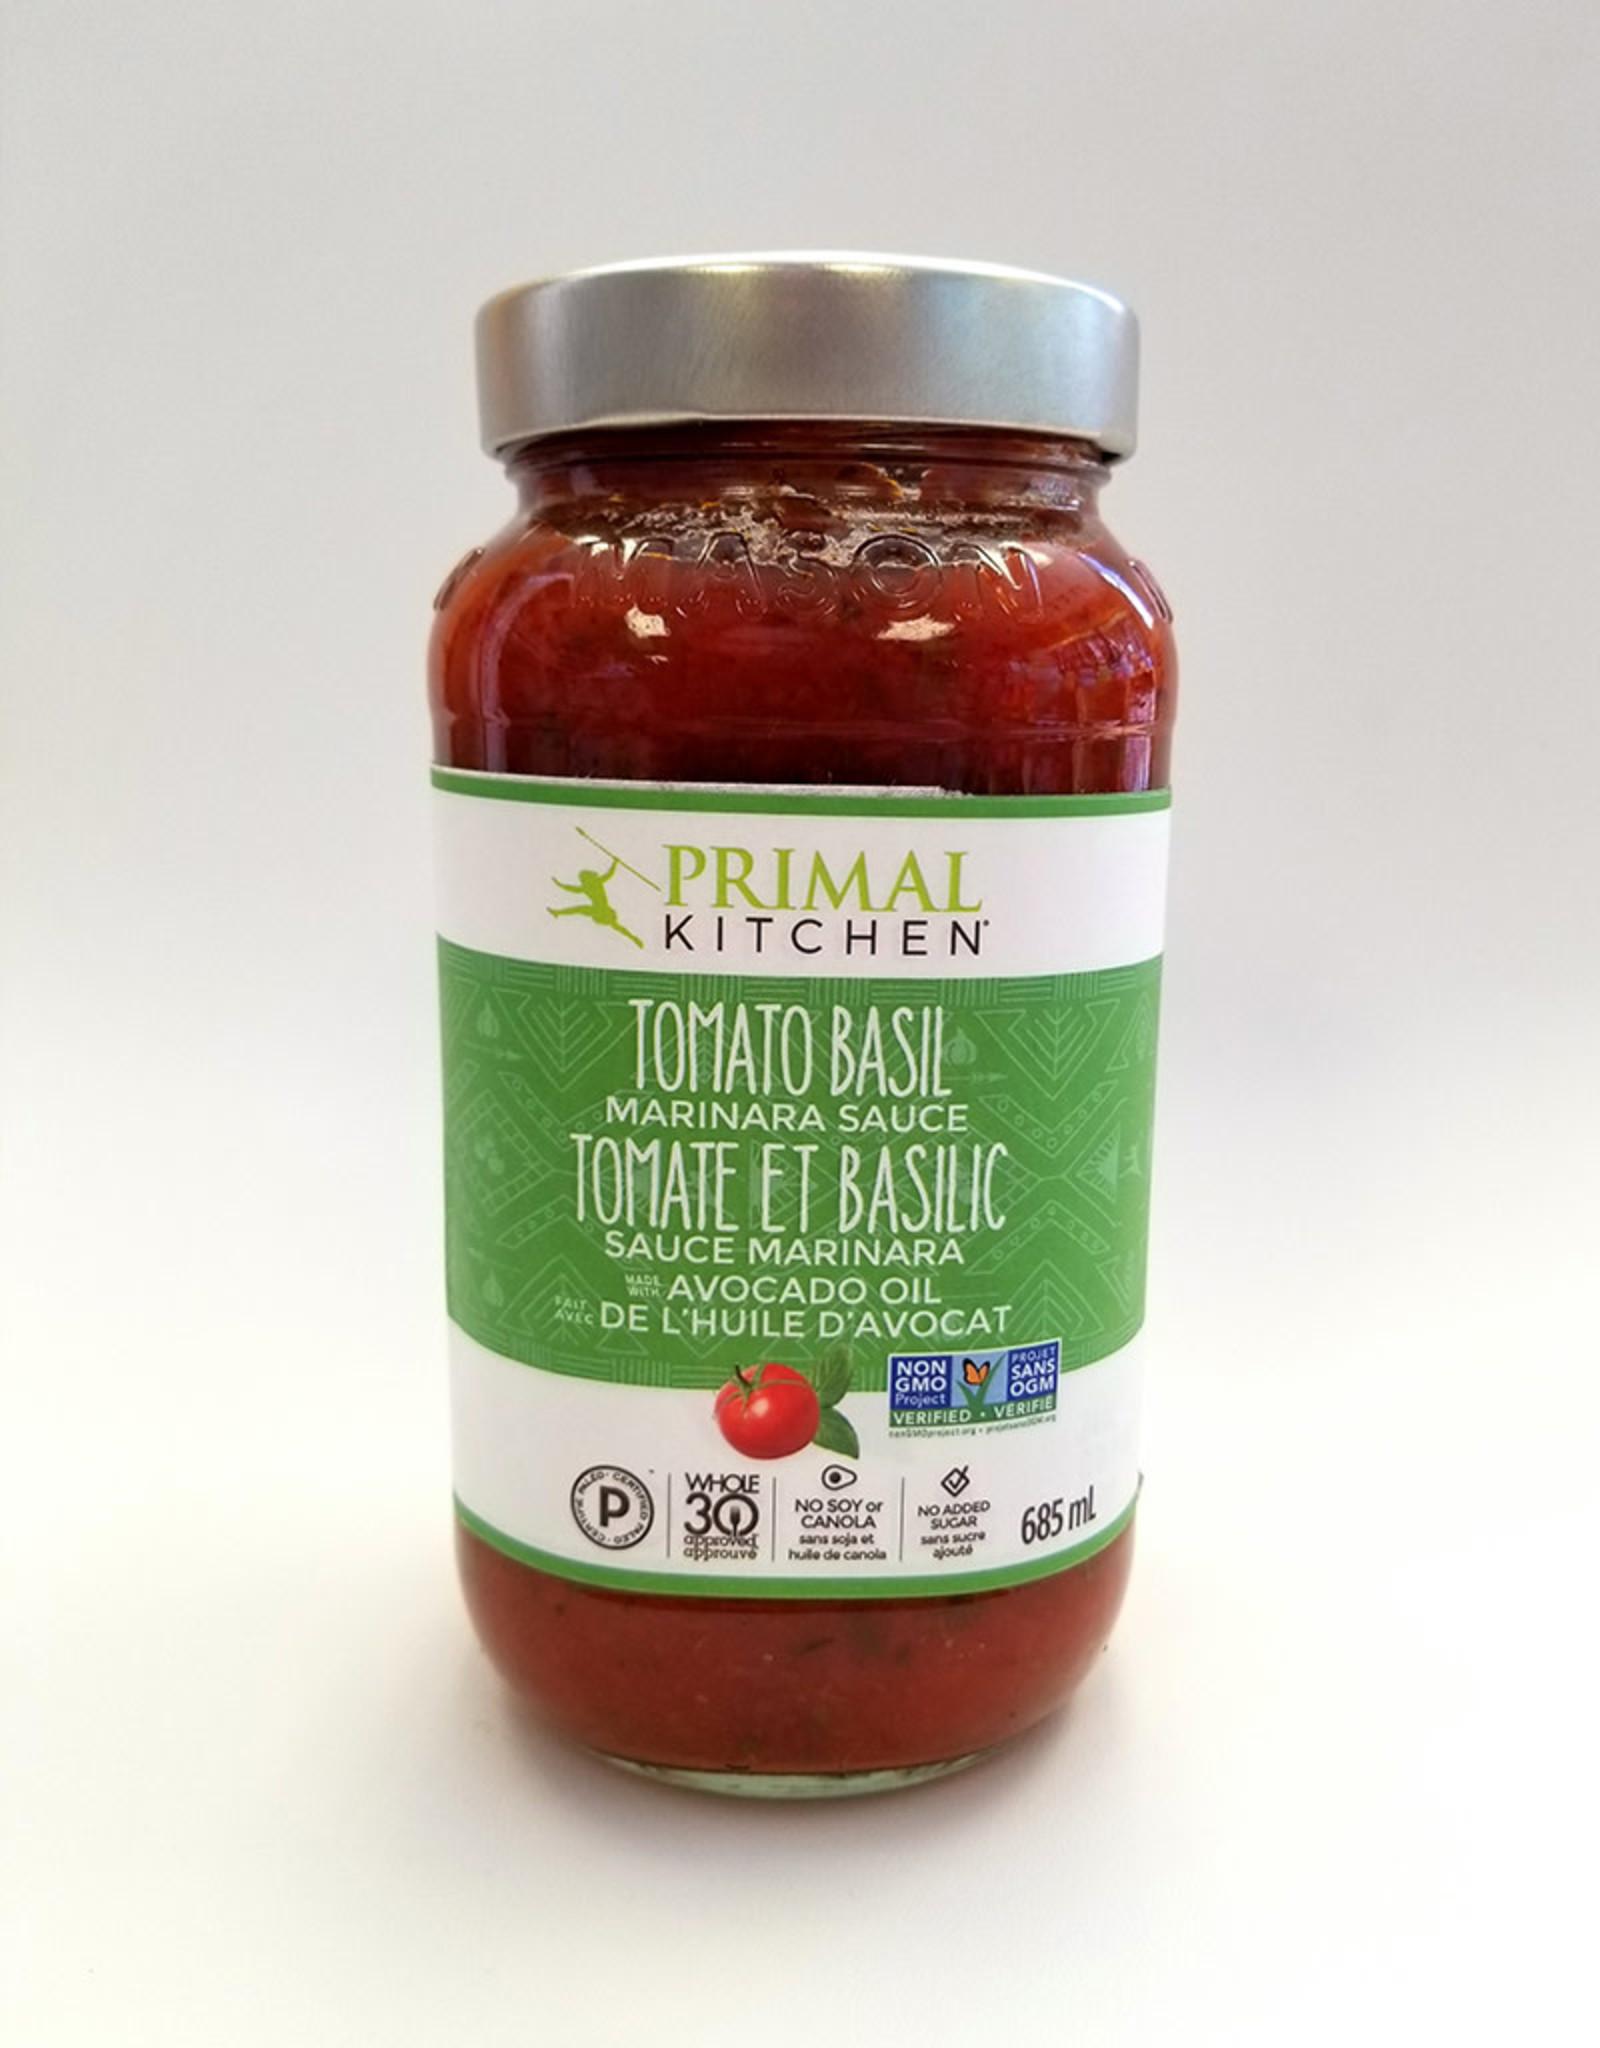 Primal Kitchen Primal Kitchen - Sauce, Tomato Basil (685ml)